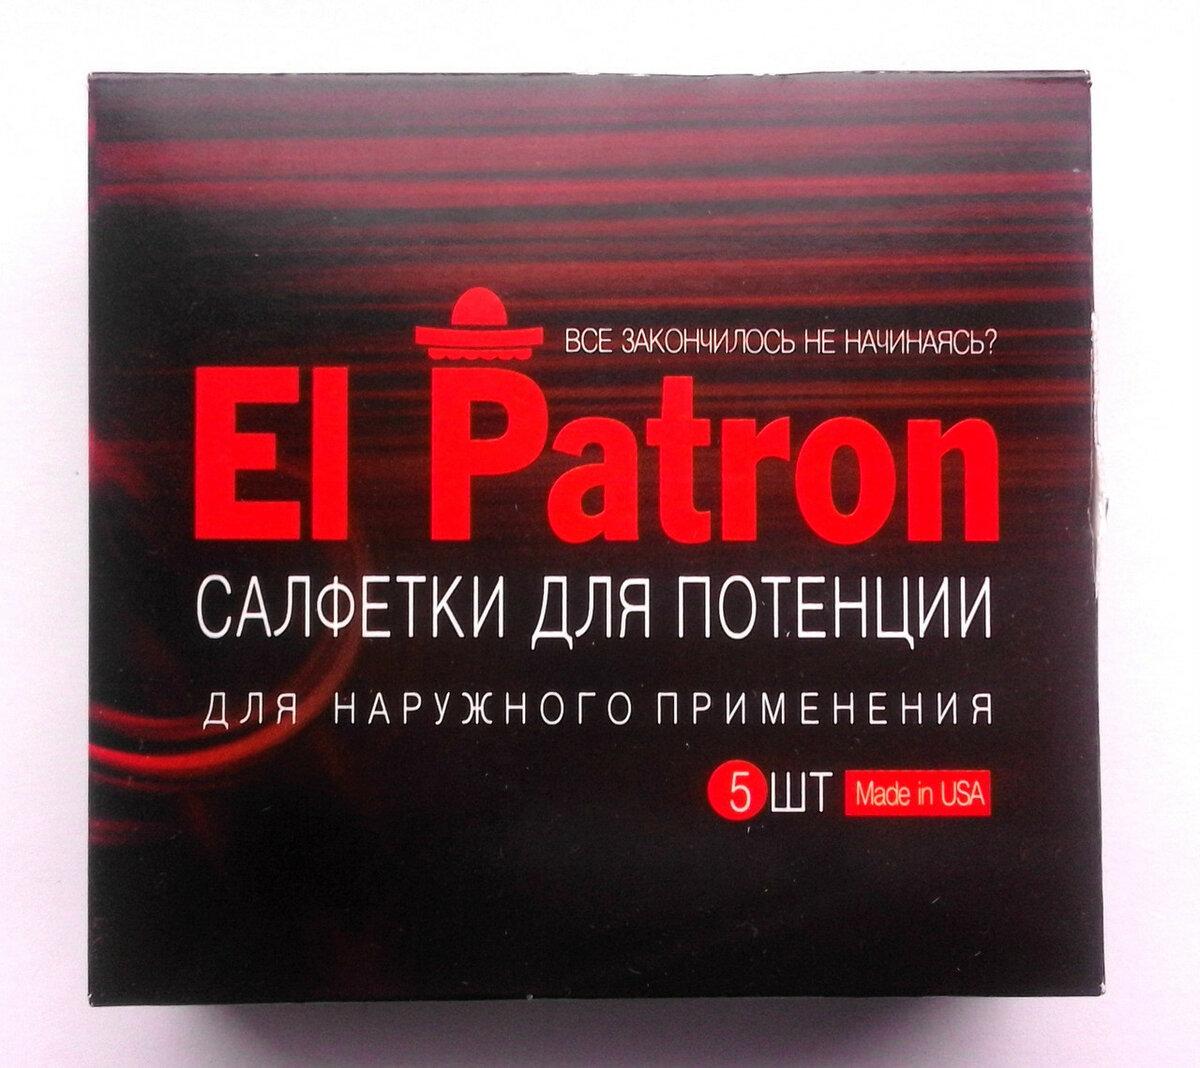 El Patron - салфетки для потенции в Талдыкоргане